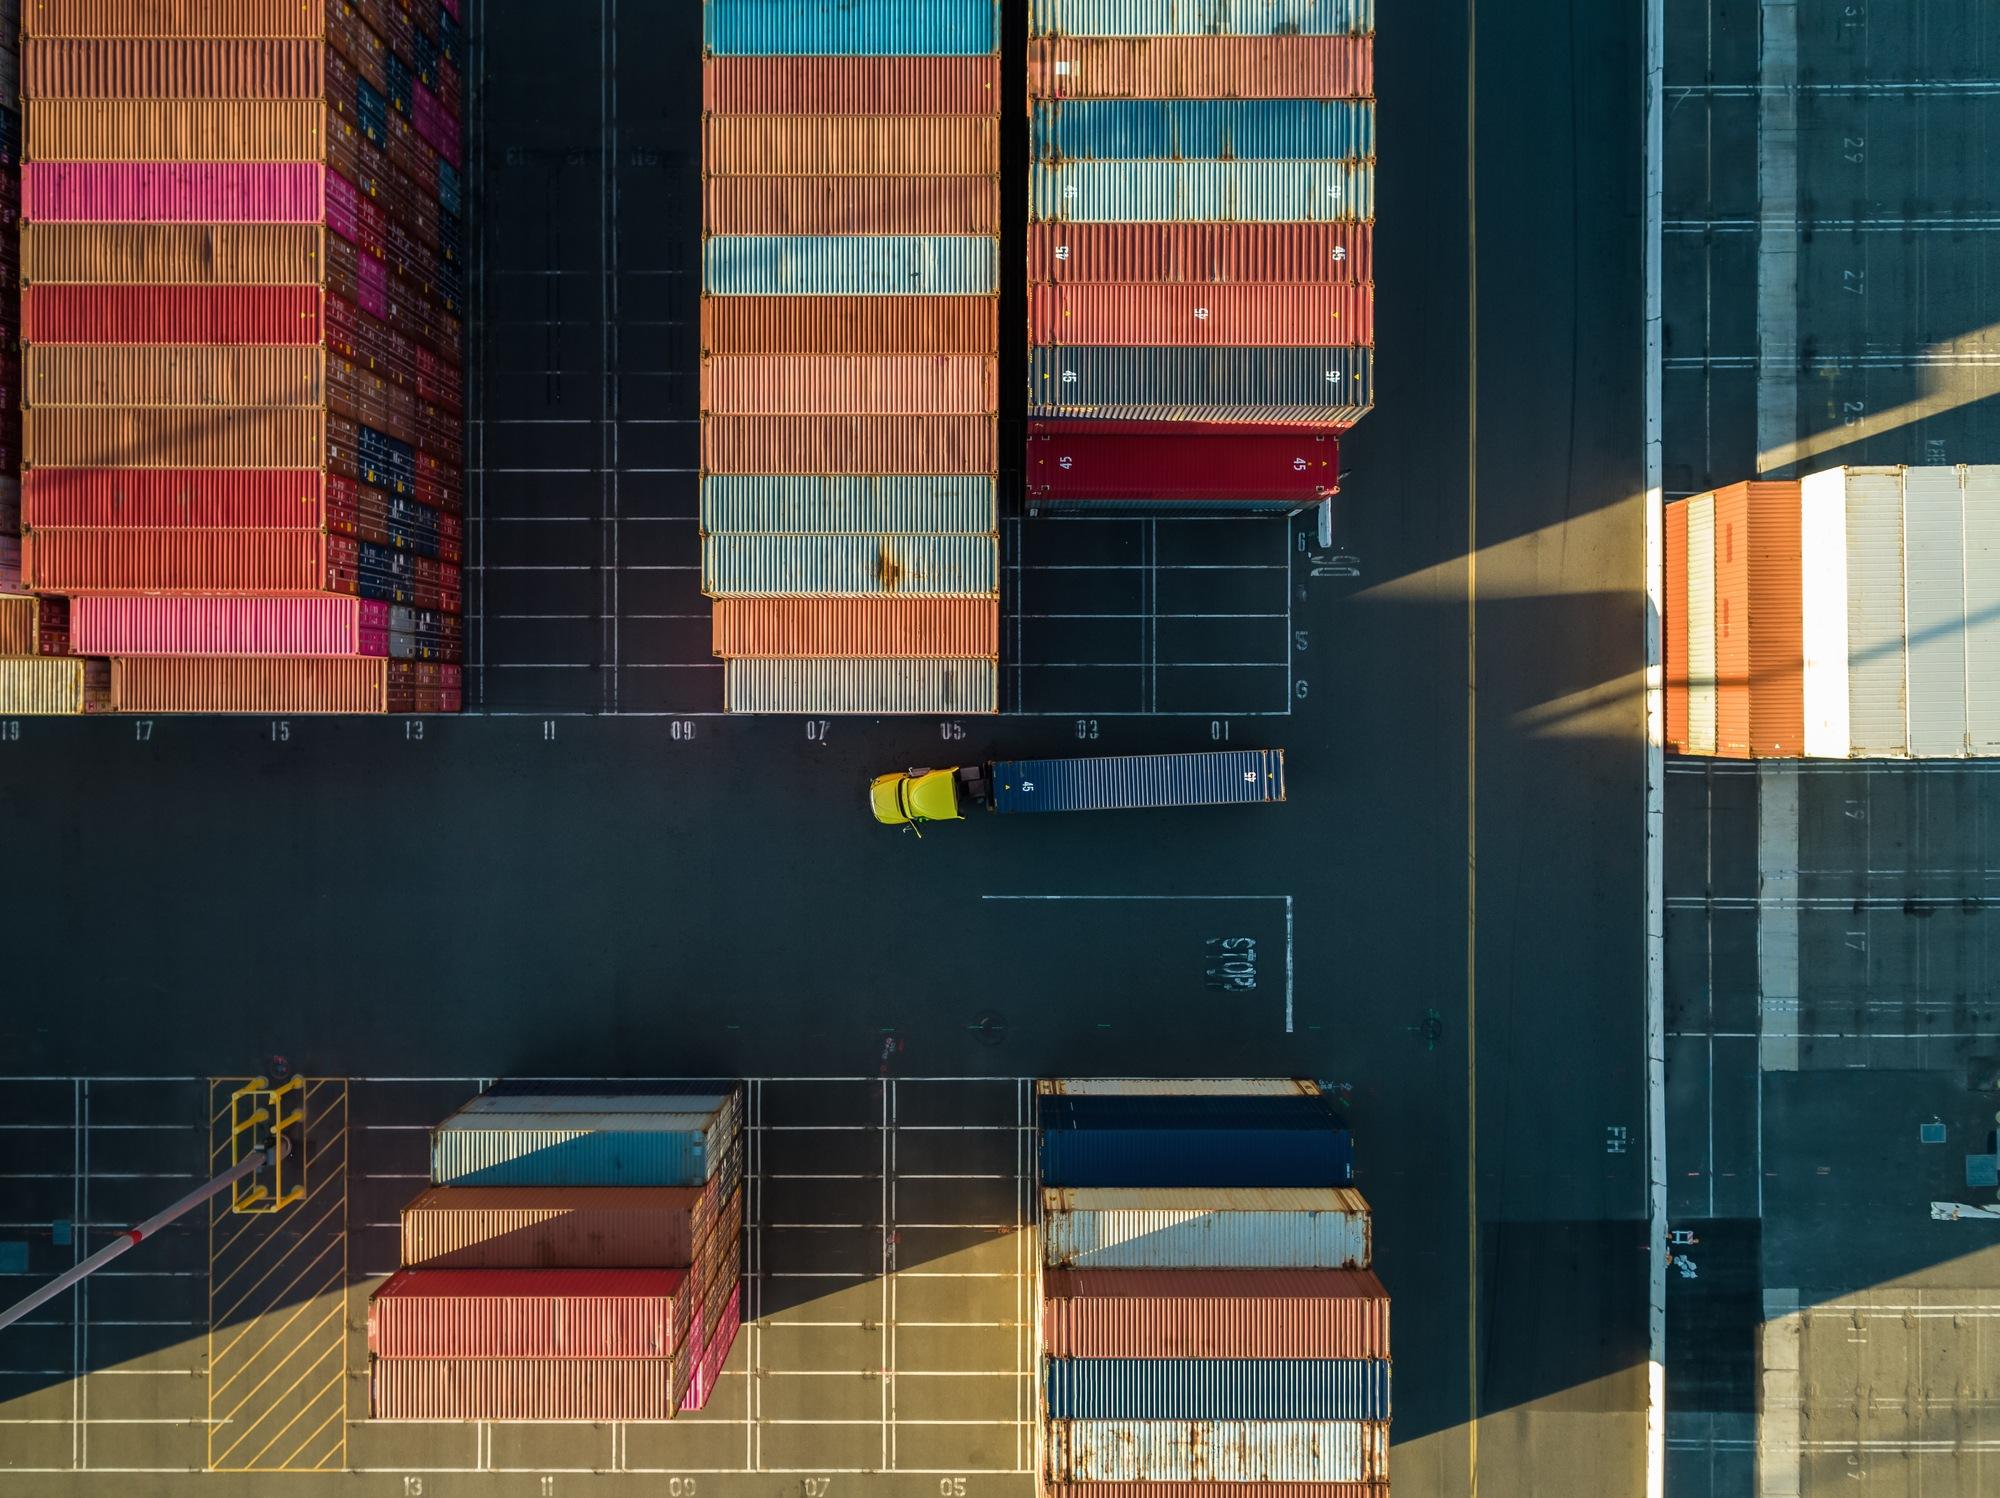 Aerial shot of an intermodal shipping yard in the Port of Long Beach, California.